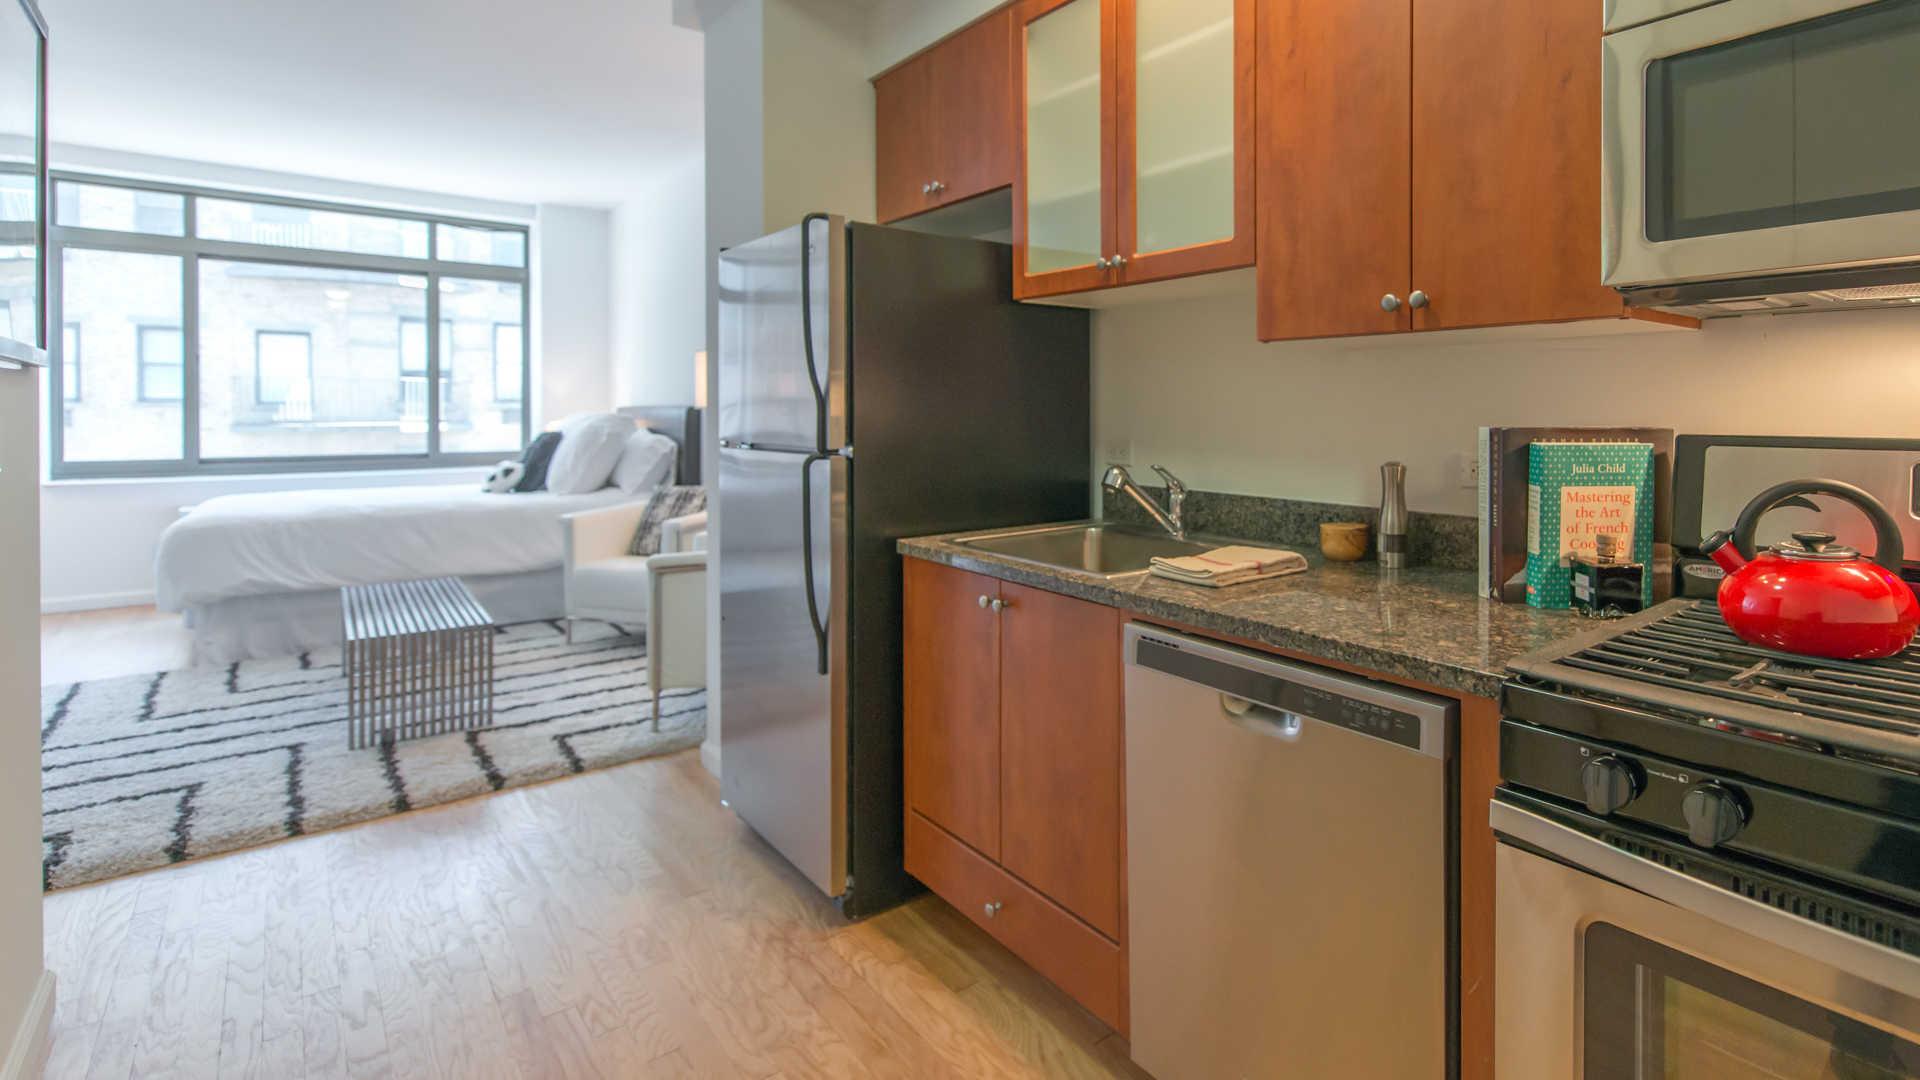 600 Washington Apartments In West Village Street Equityapartments